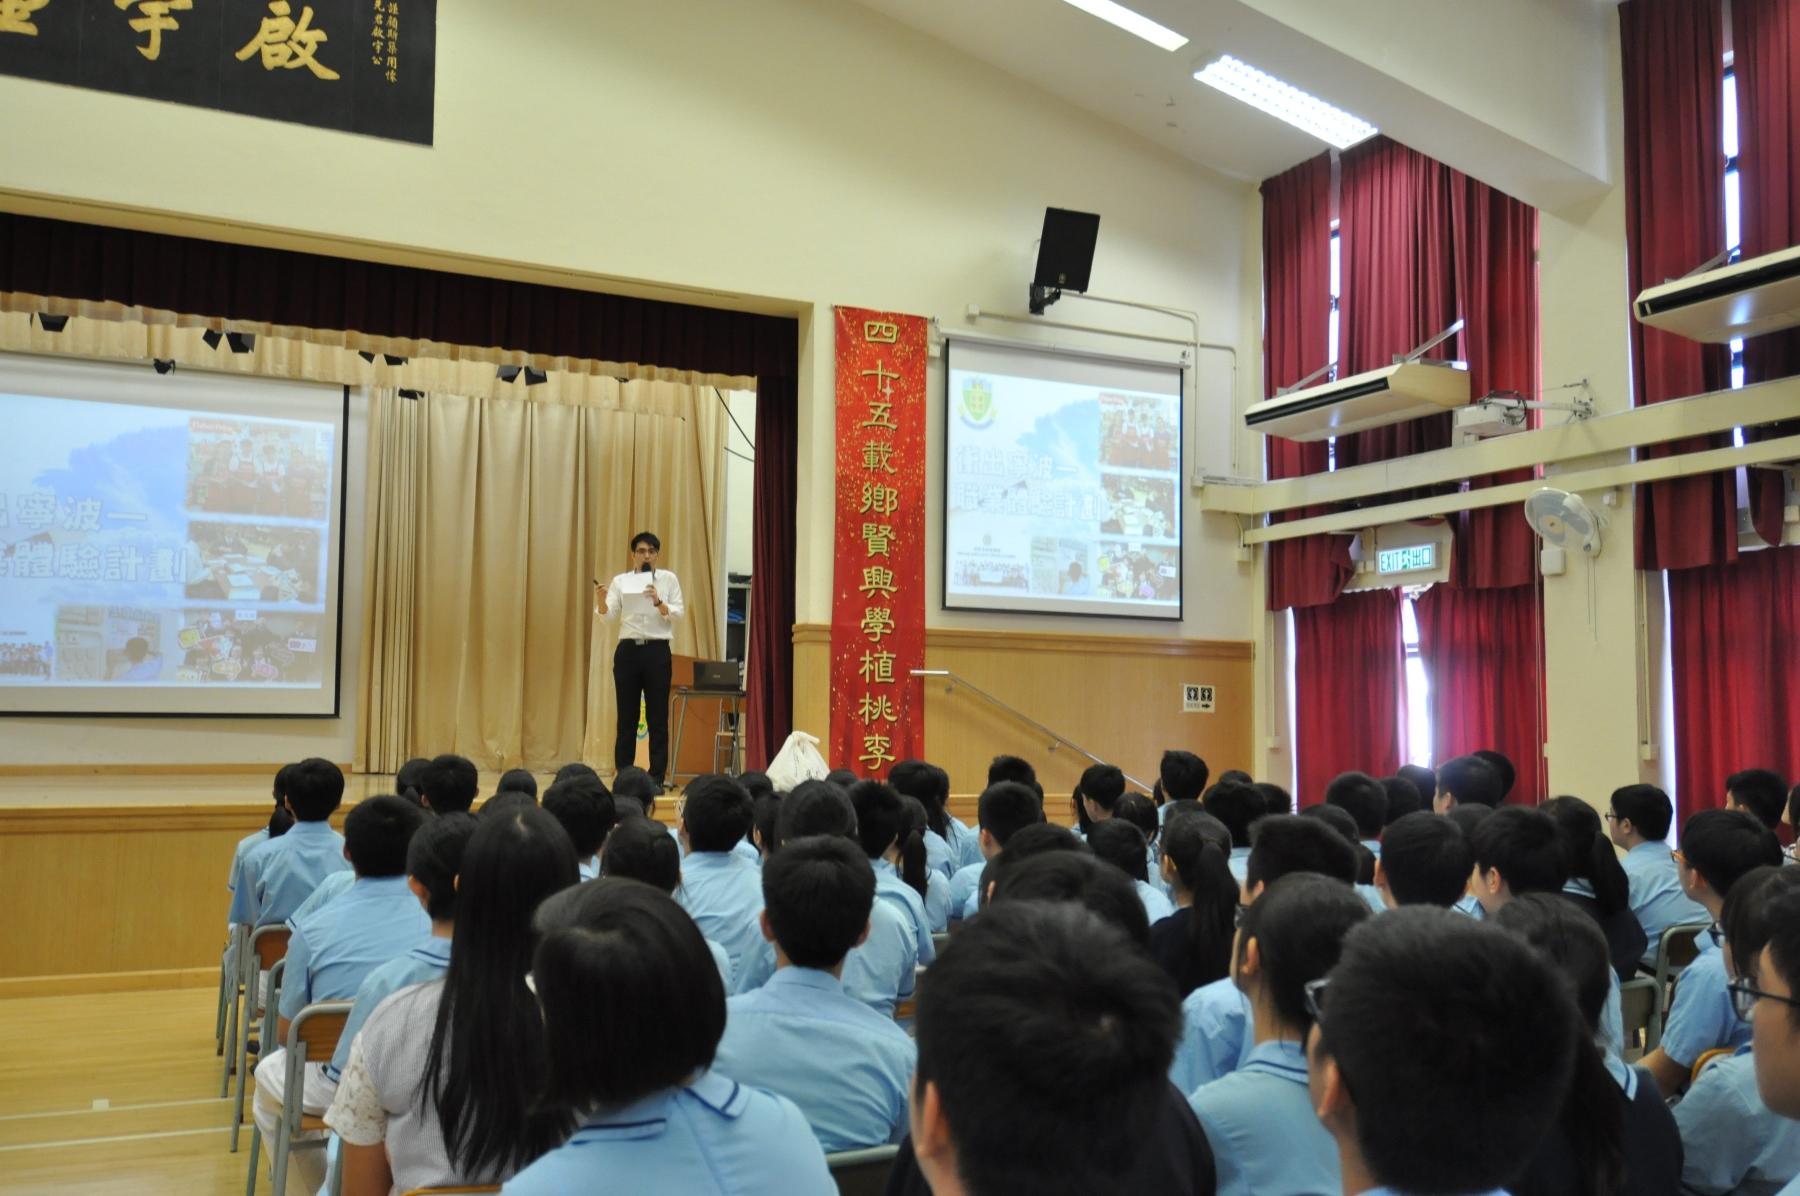 http://www.npc.edu.hk/sites/default/files/dsc_0050.jpg